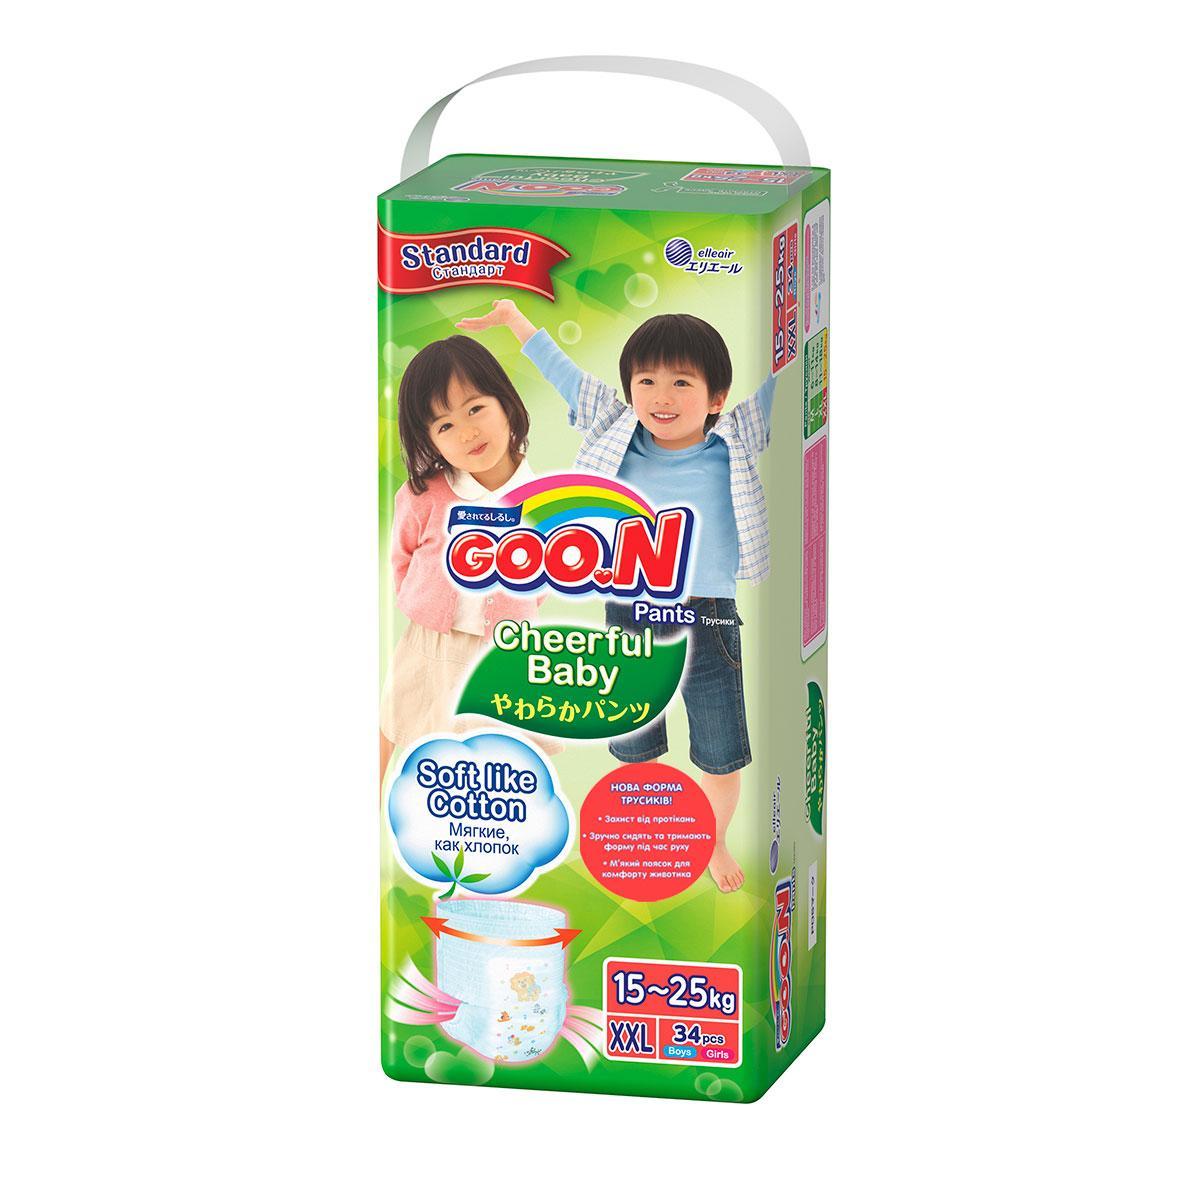 Трусики-подгузники CHEERFUL BABY для детей (размер XXL, унисекс, 34 шт), 843287